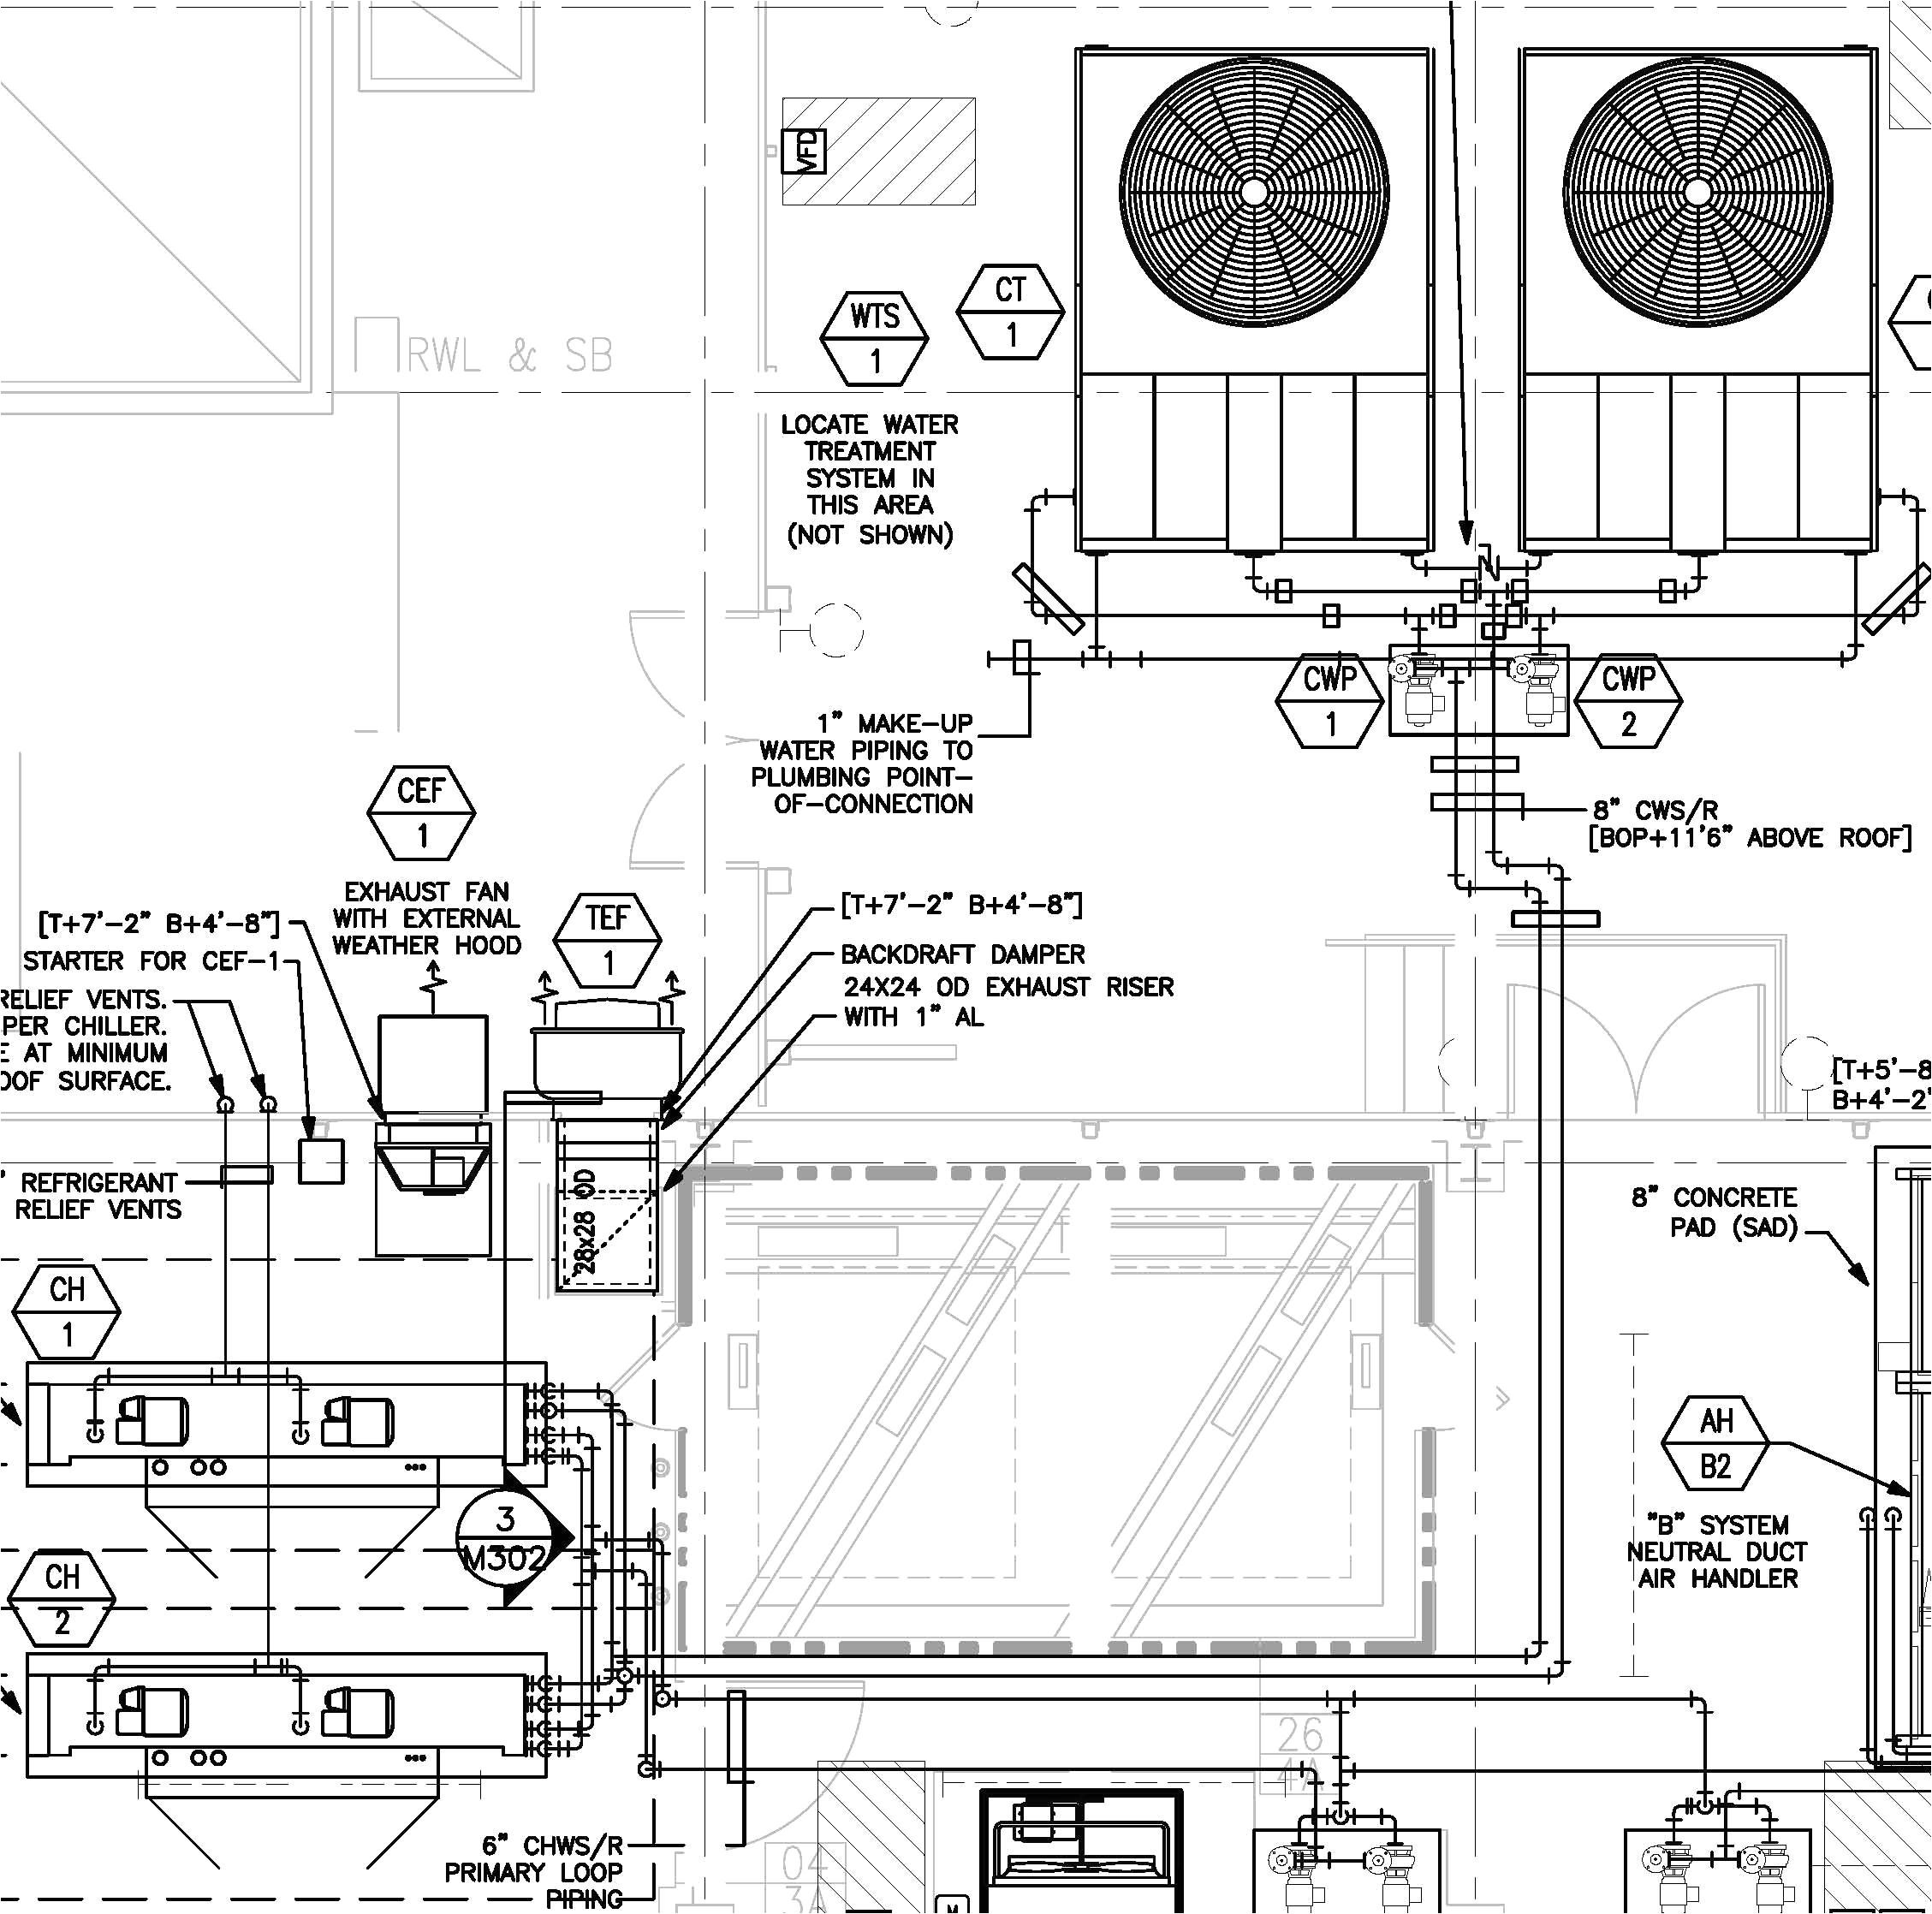 3 wire submersible pump wiring diagram unique 2 wire submersible wiring a 2 wire well pump